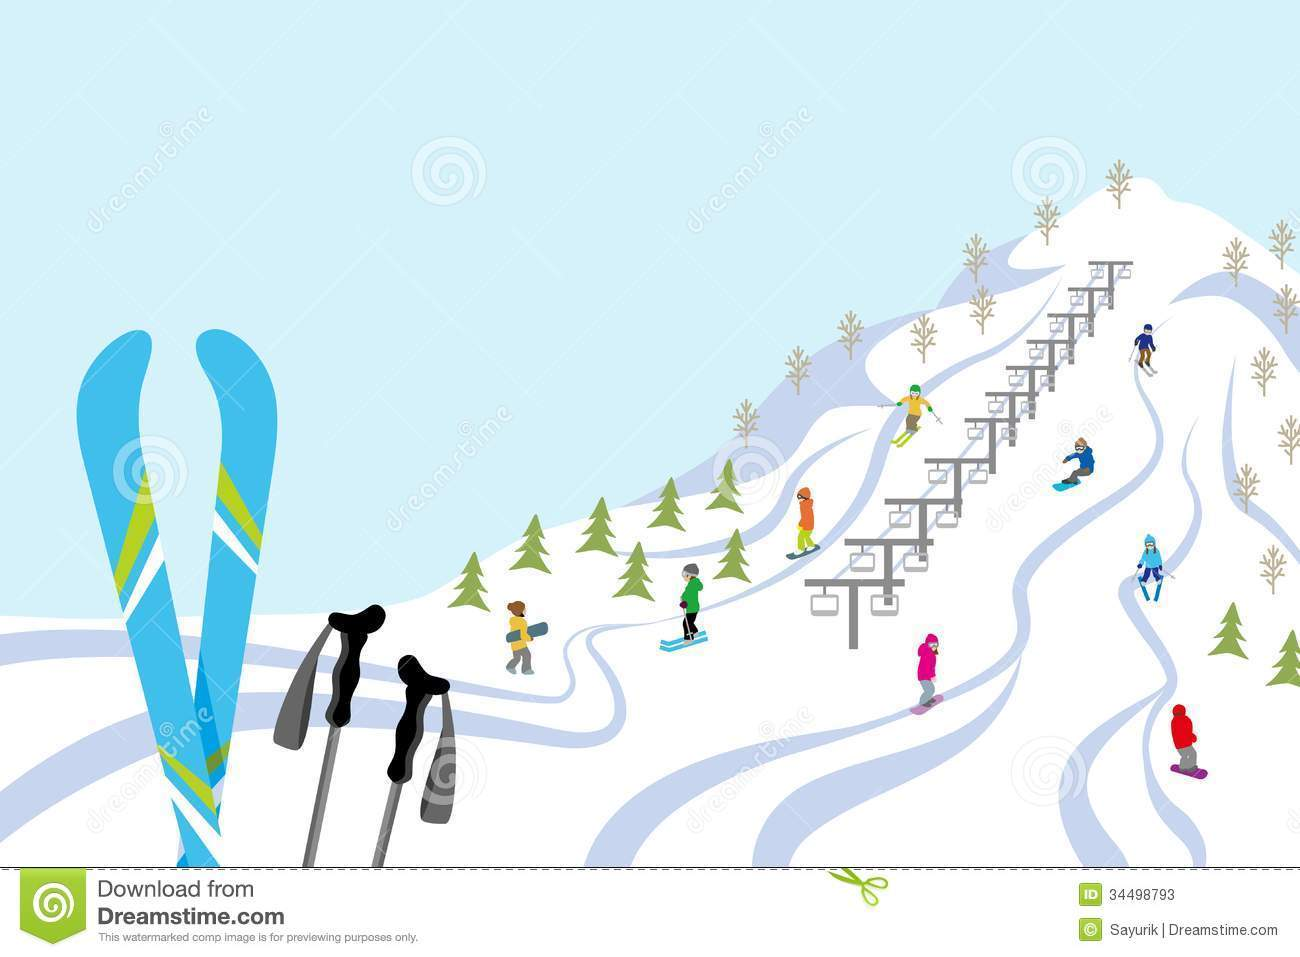 Ski resort clipart » Clipart Portal.